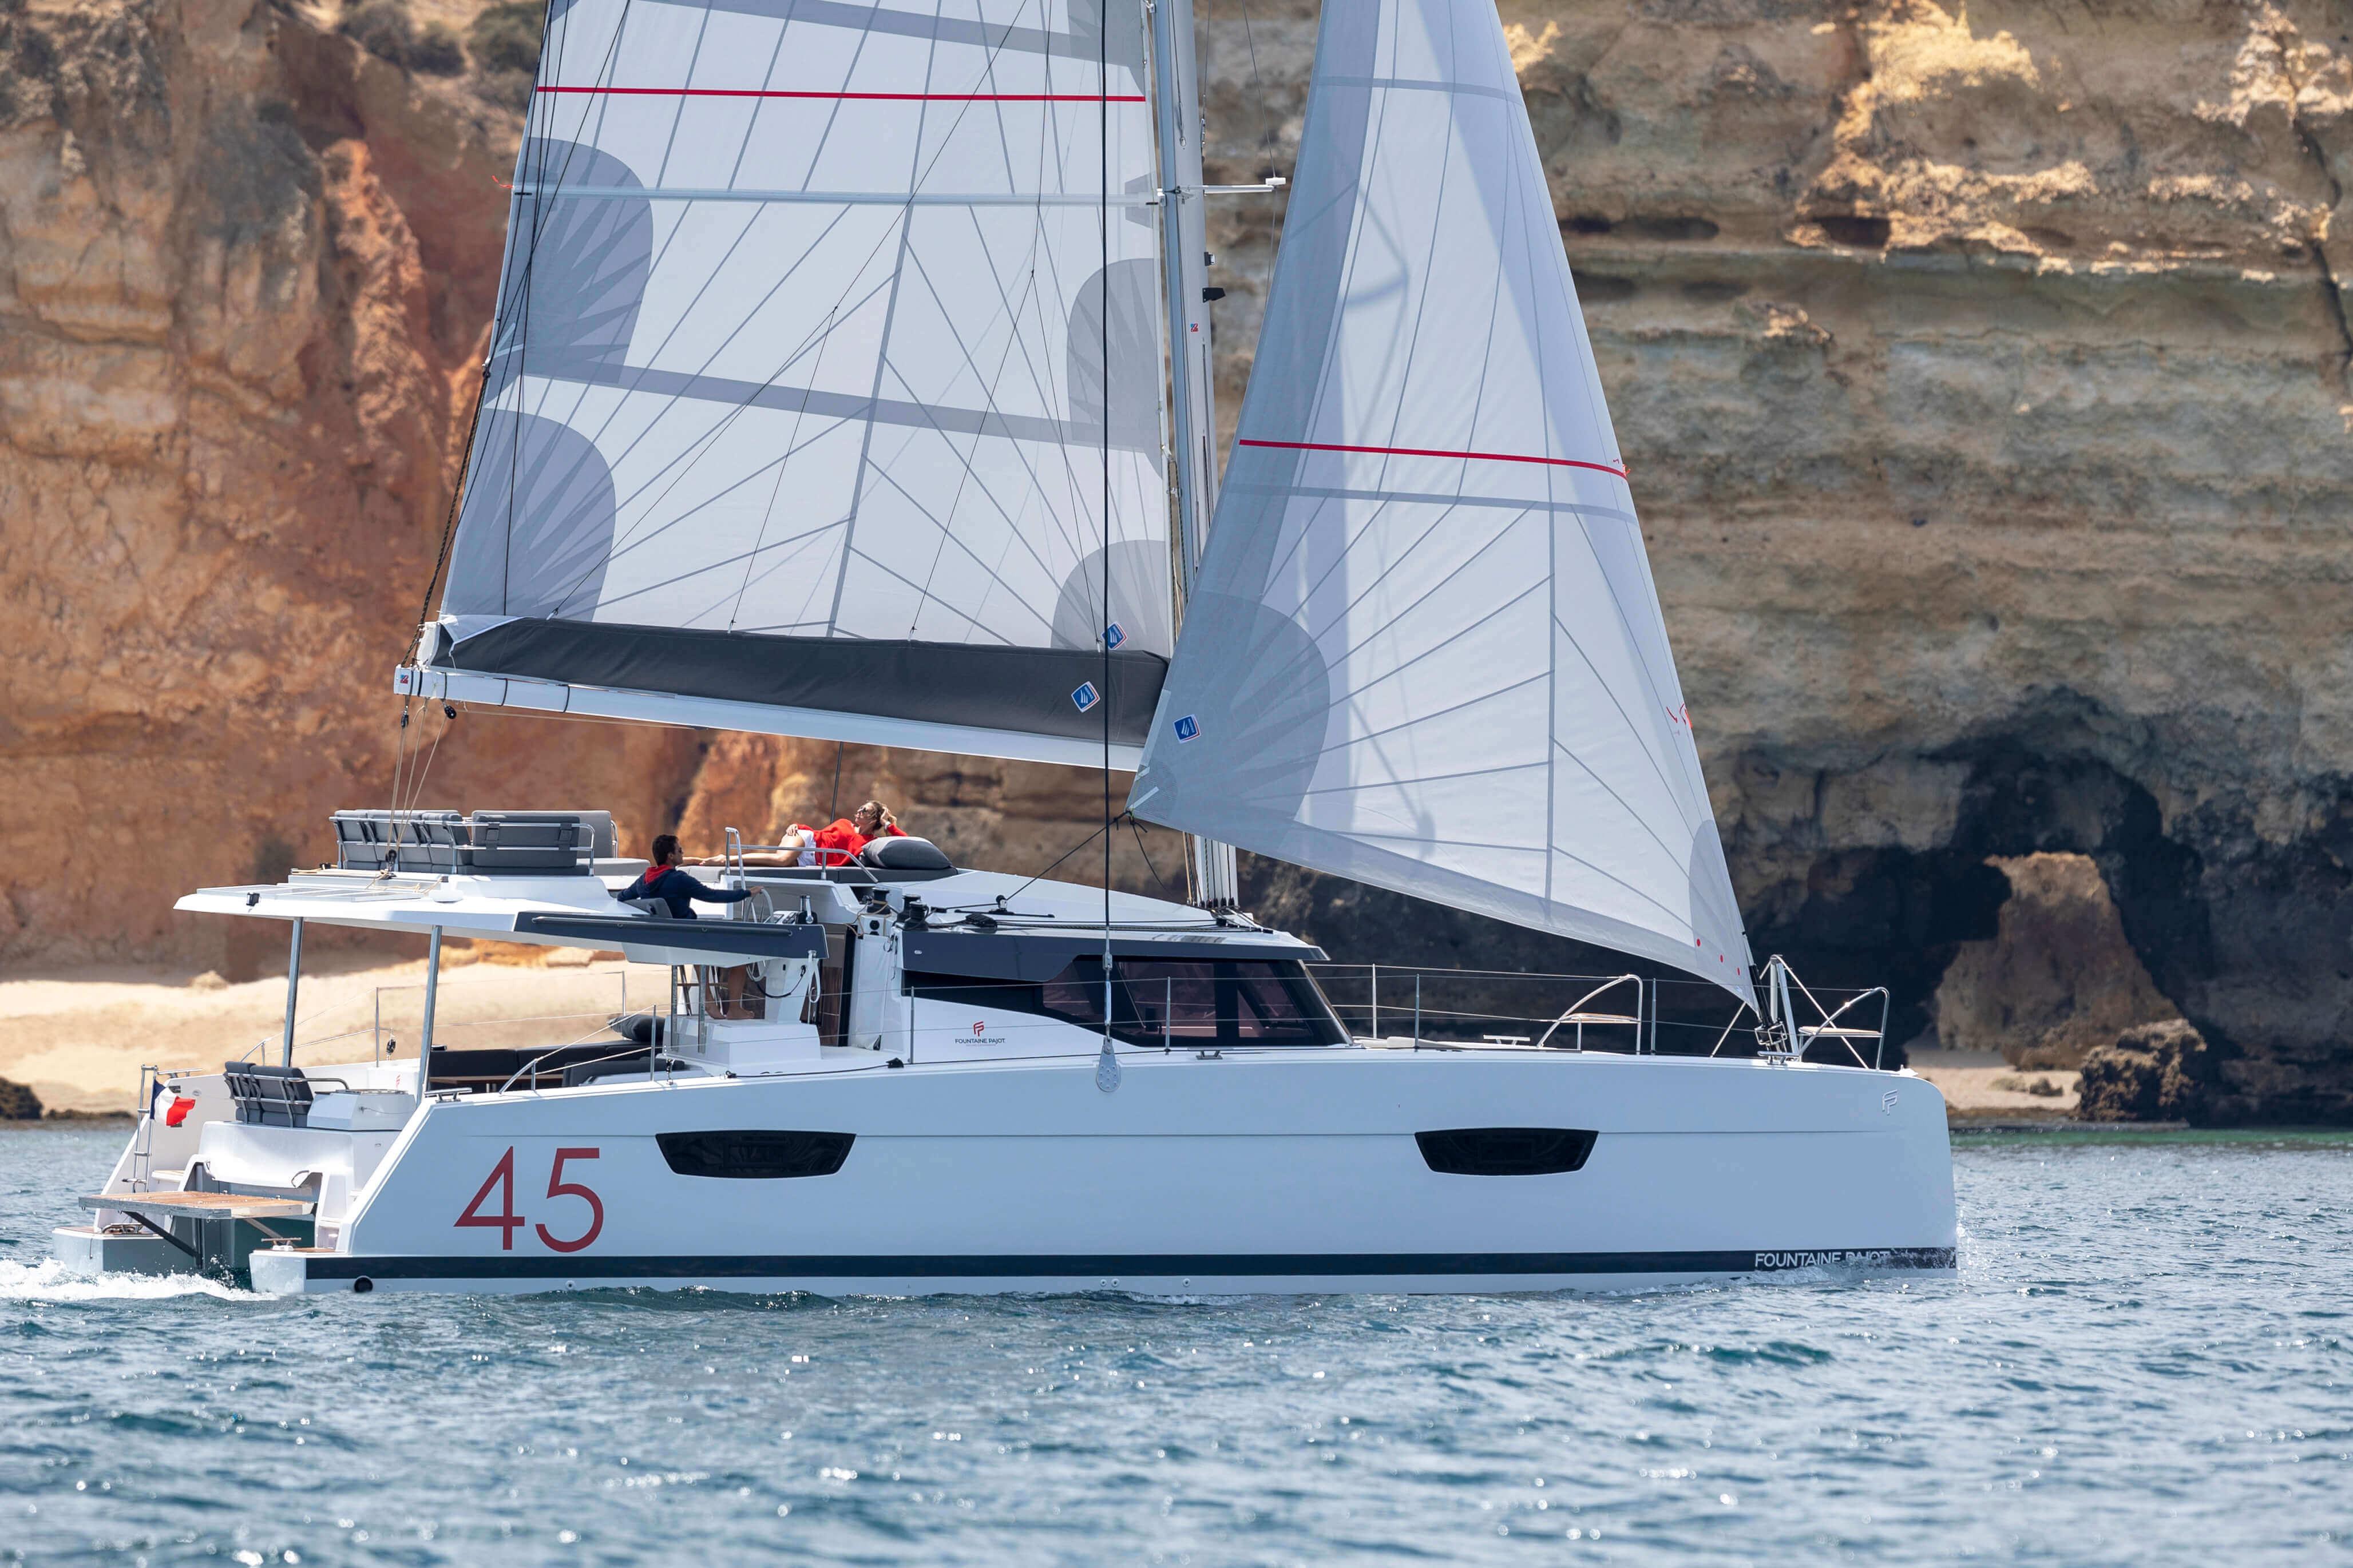 New Sail Catamaran for Sale 2021 Elba 45 Boat Highlights